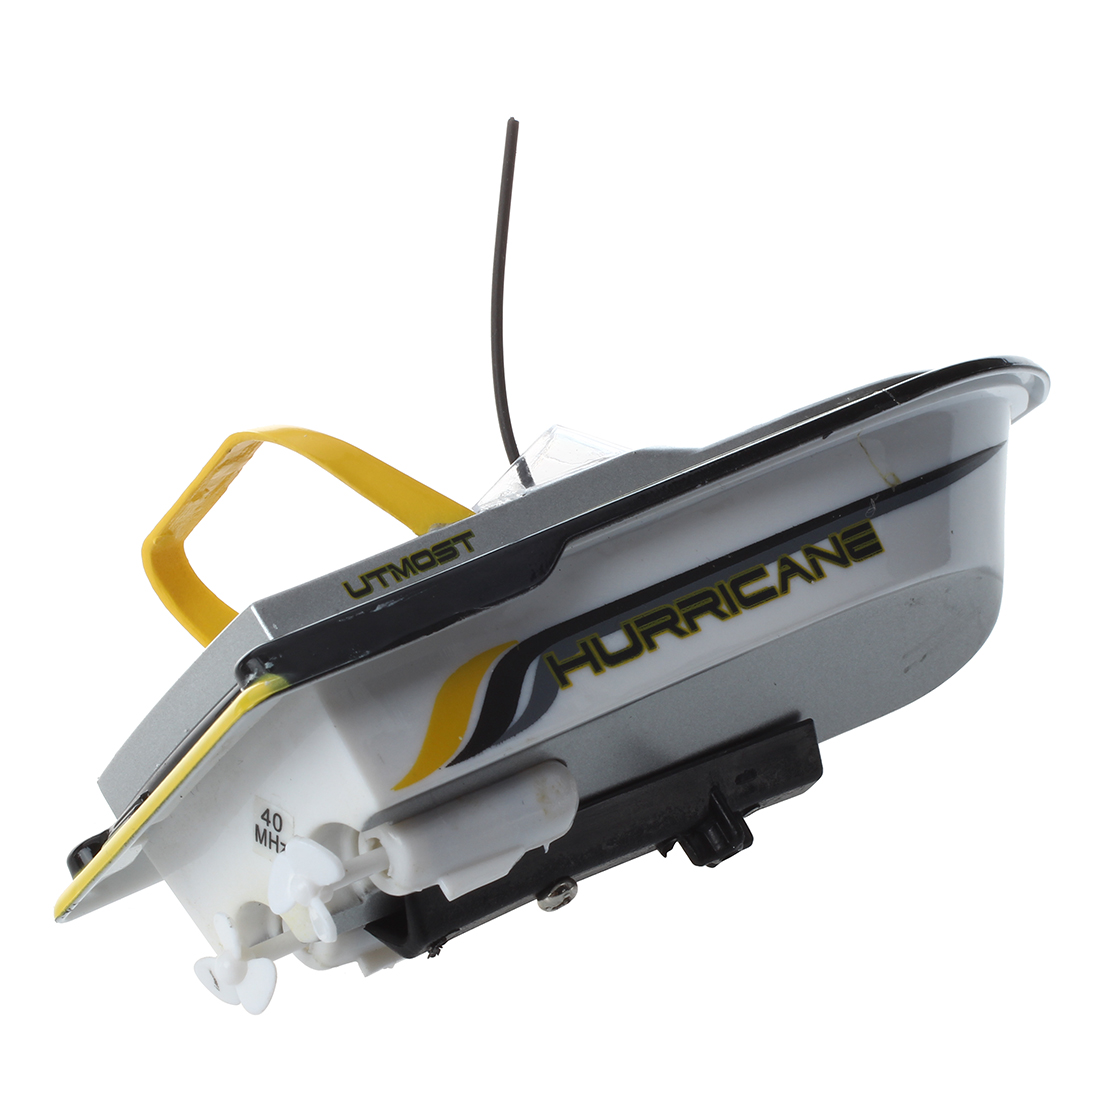 Miniature Mini 3352 RC Boat Radio Remote Control Yellow Kid Toy